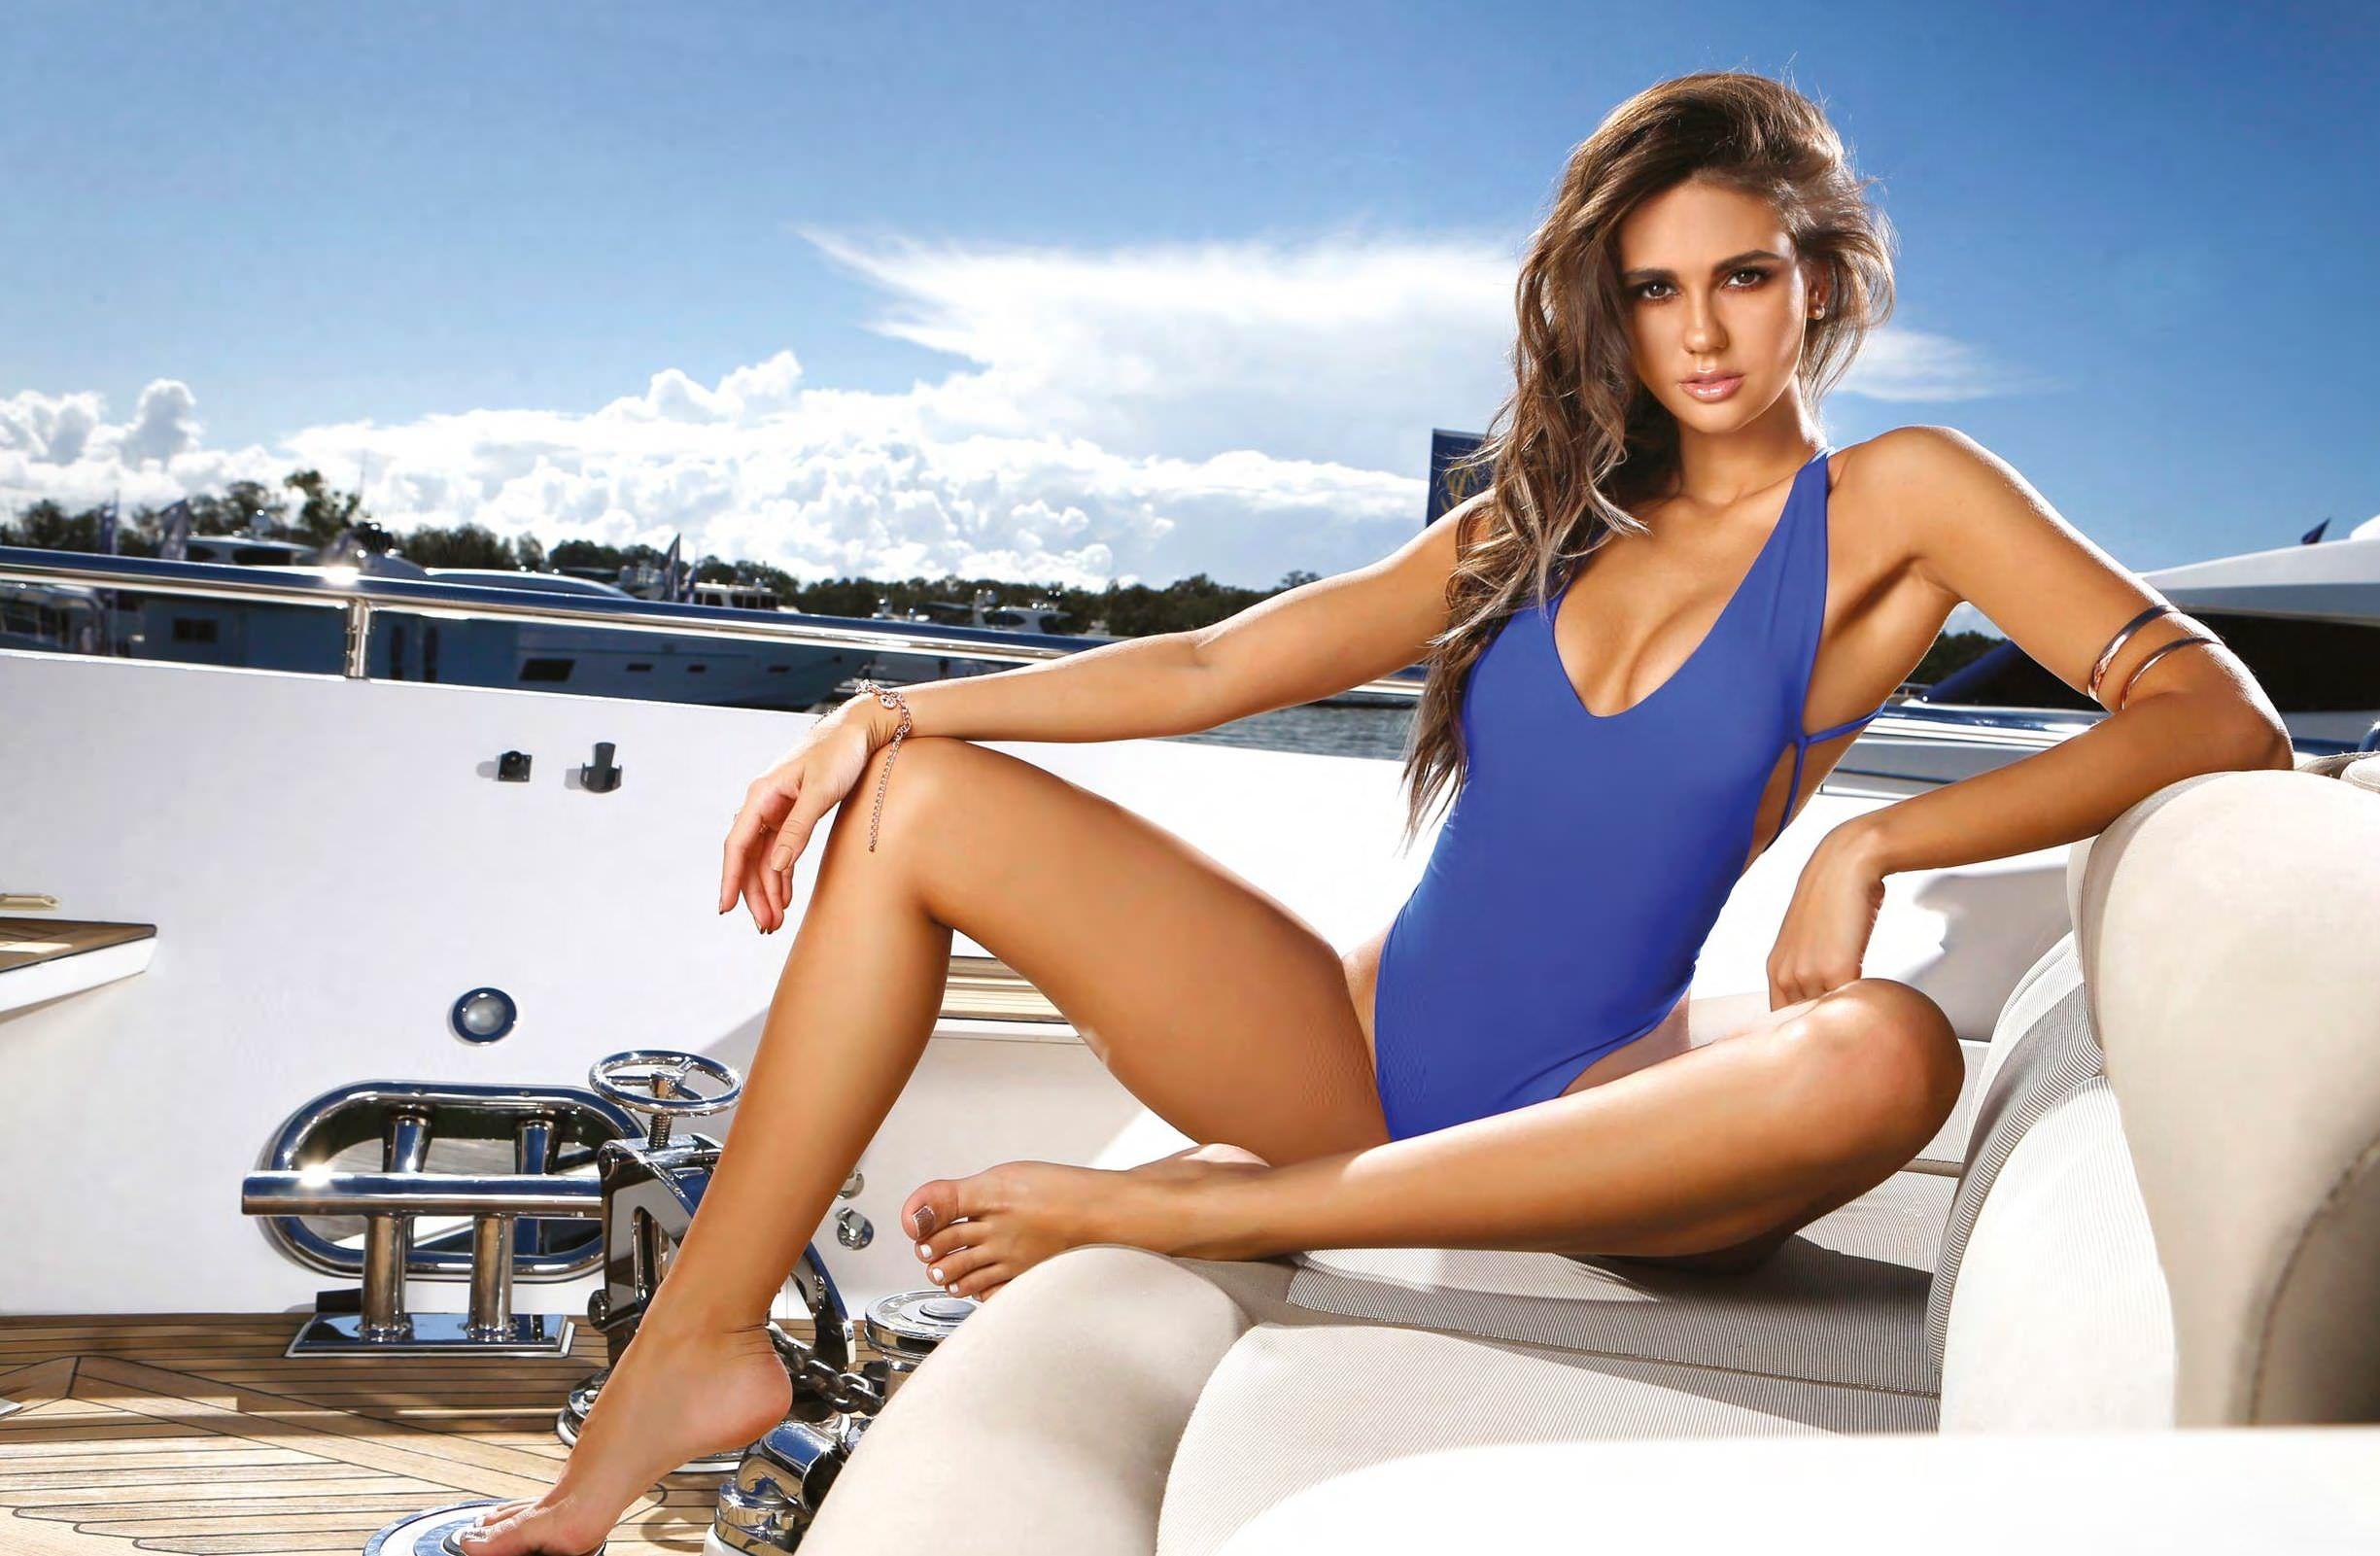 Bikini Yana Vozharovskaya nude photos 2019